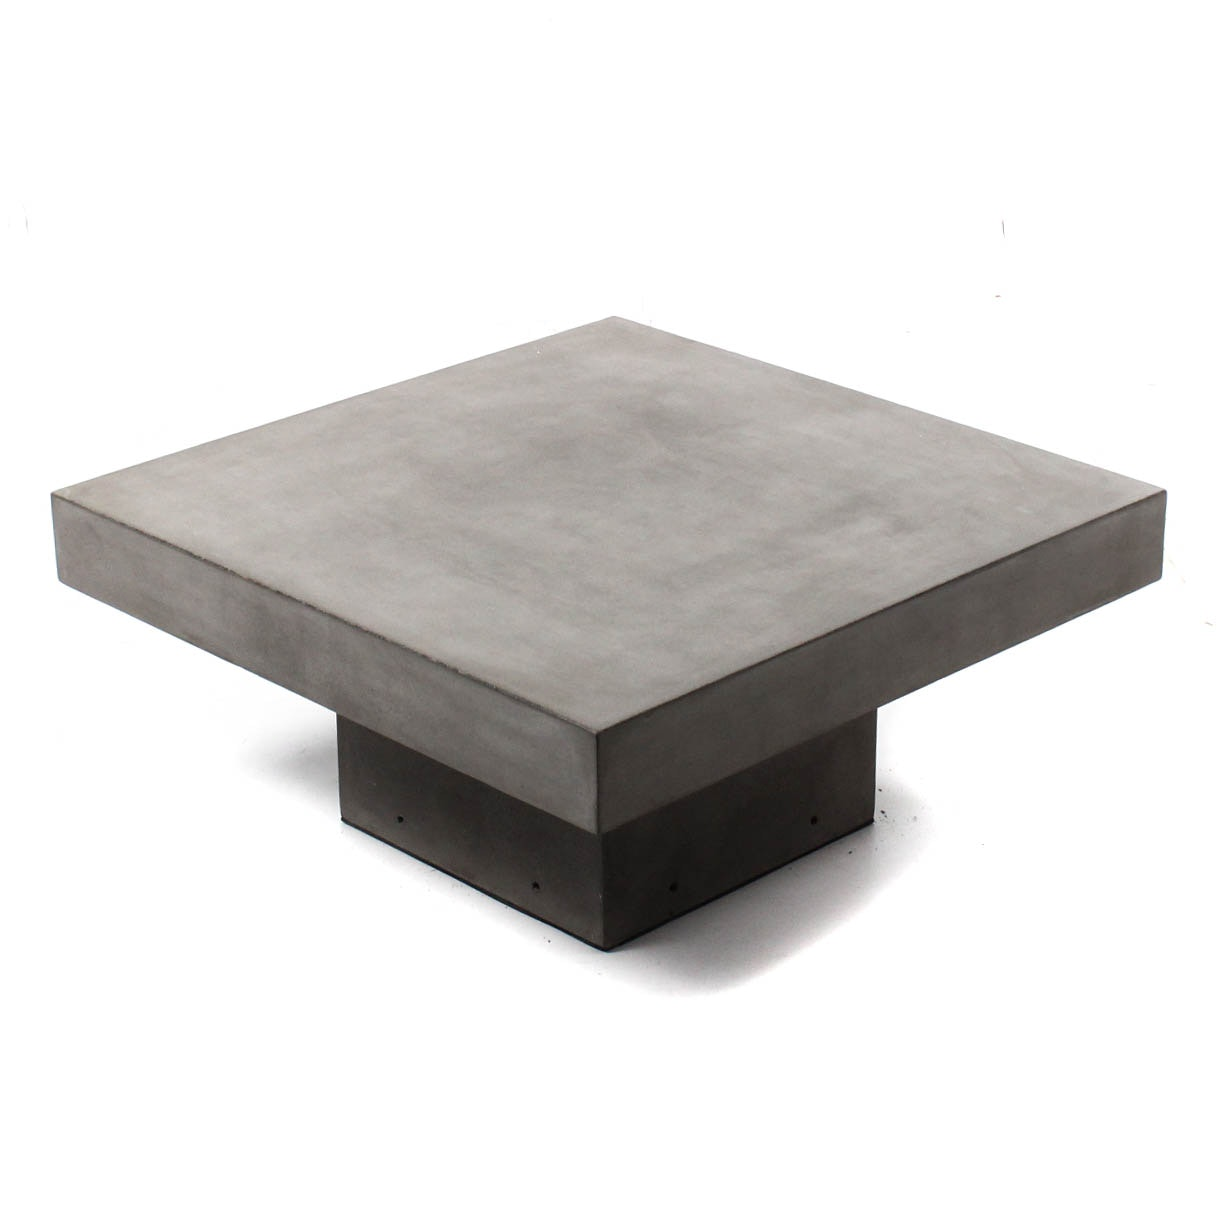 Modernist Concrete Coffee Table